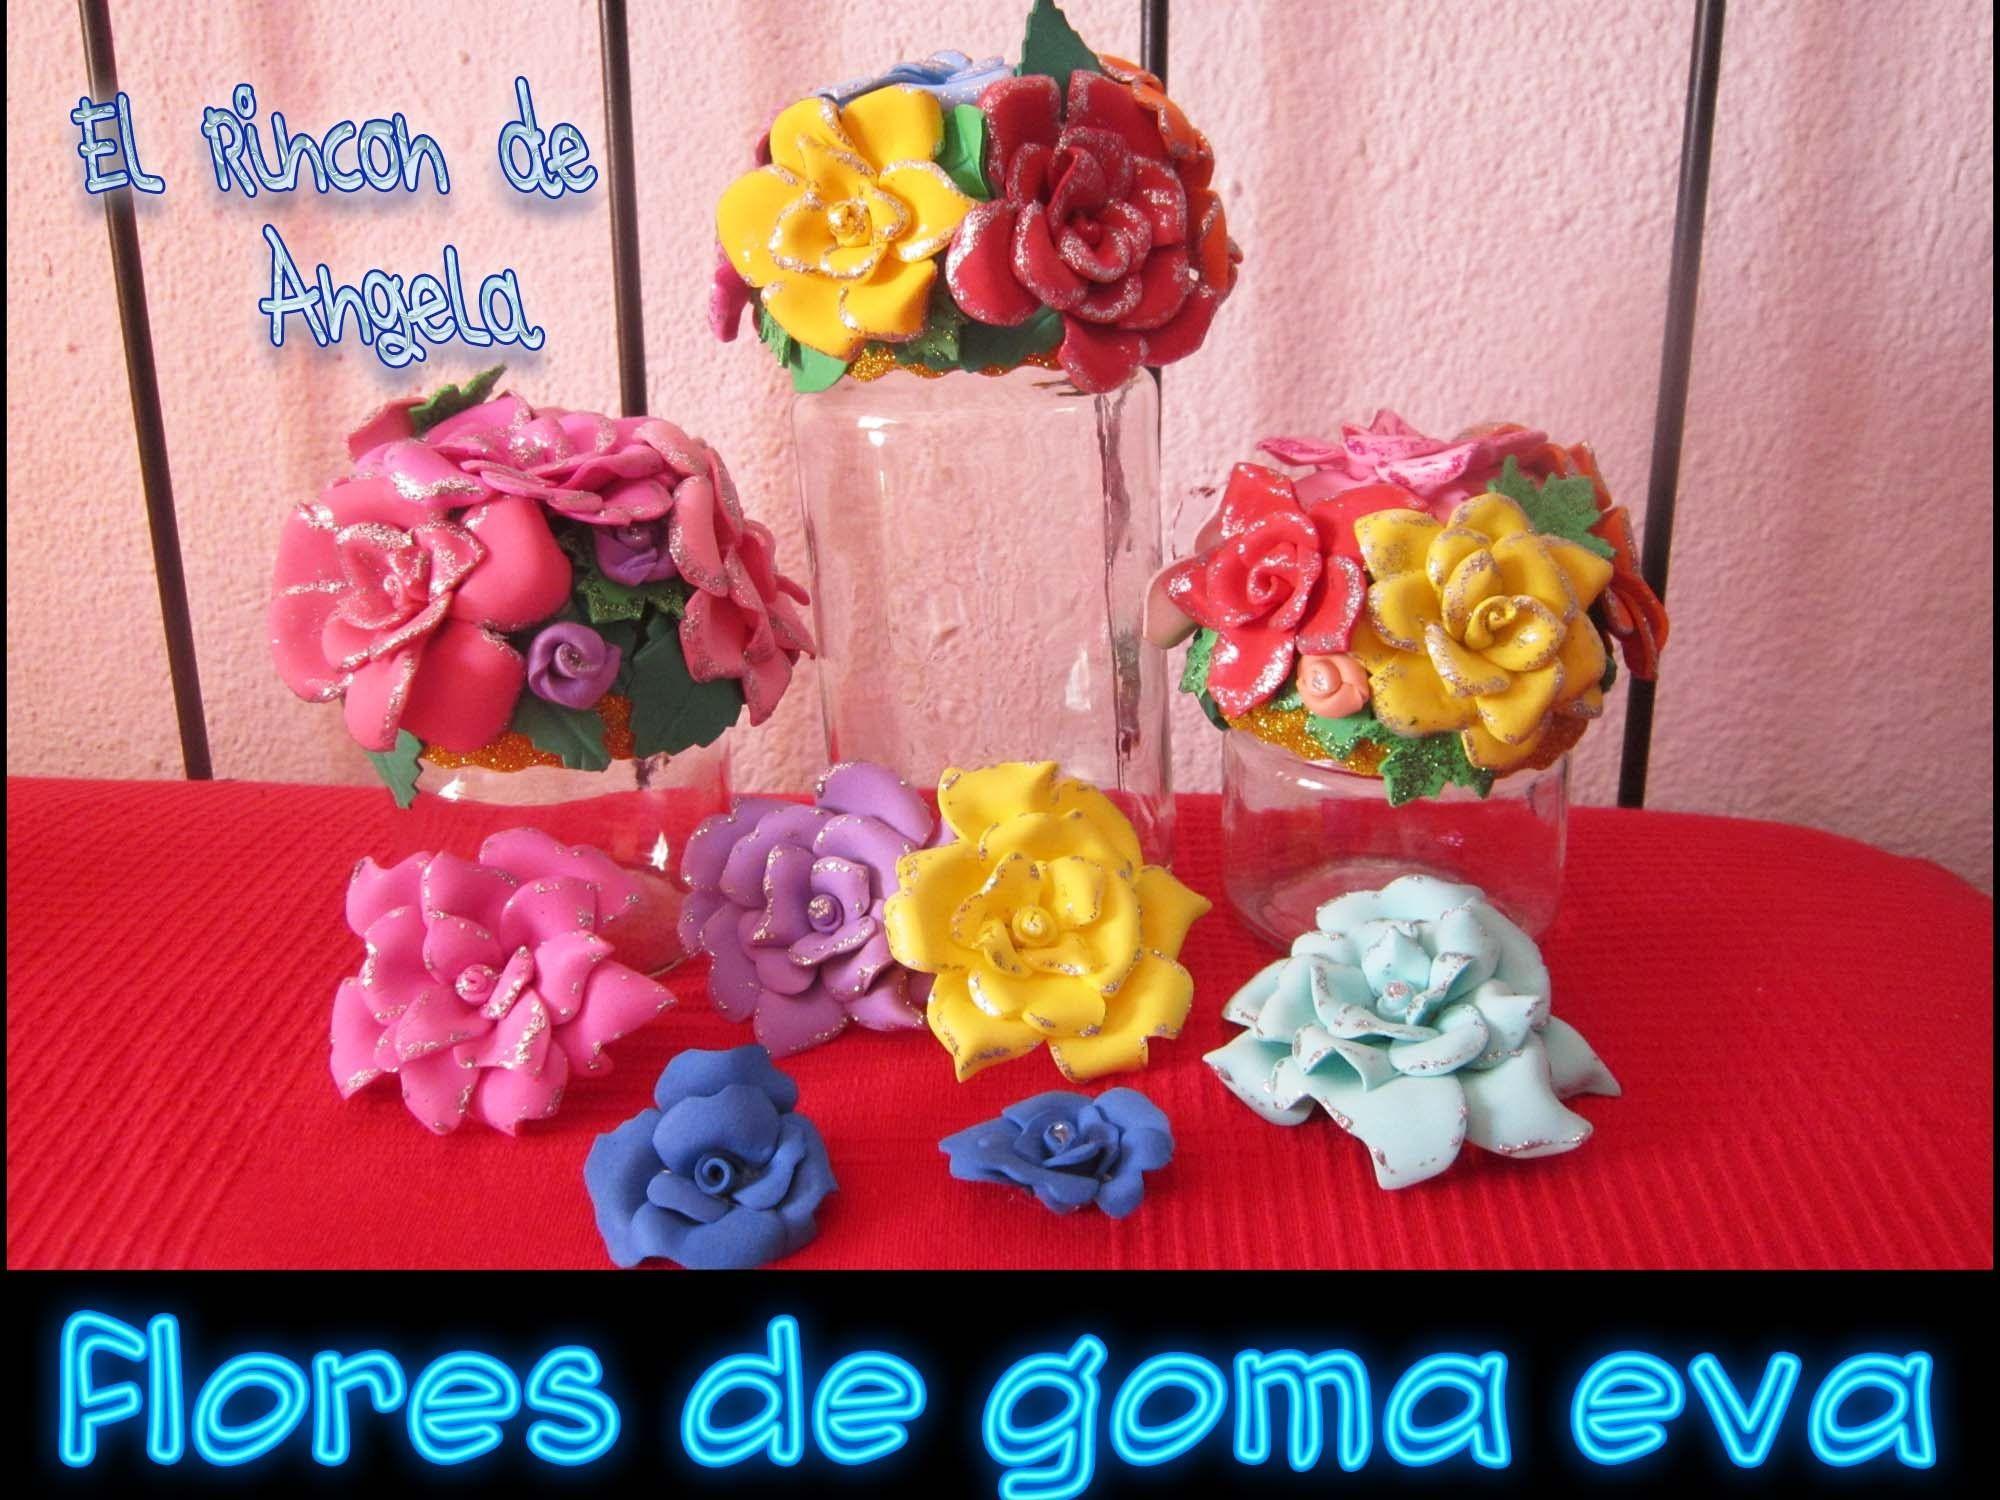 Como hacer flores de goma eva o foami para decoracion | Manualidades, Rosas  en goma eva, Como hacer flores